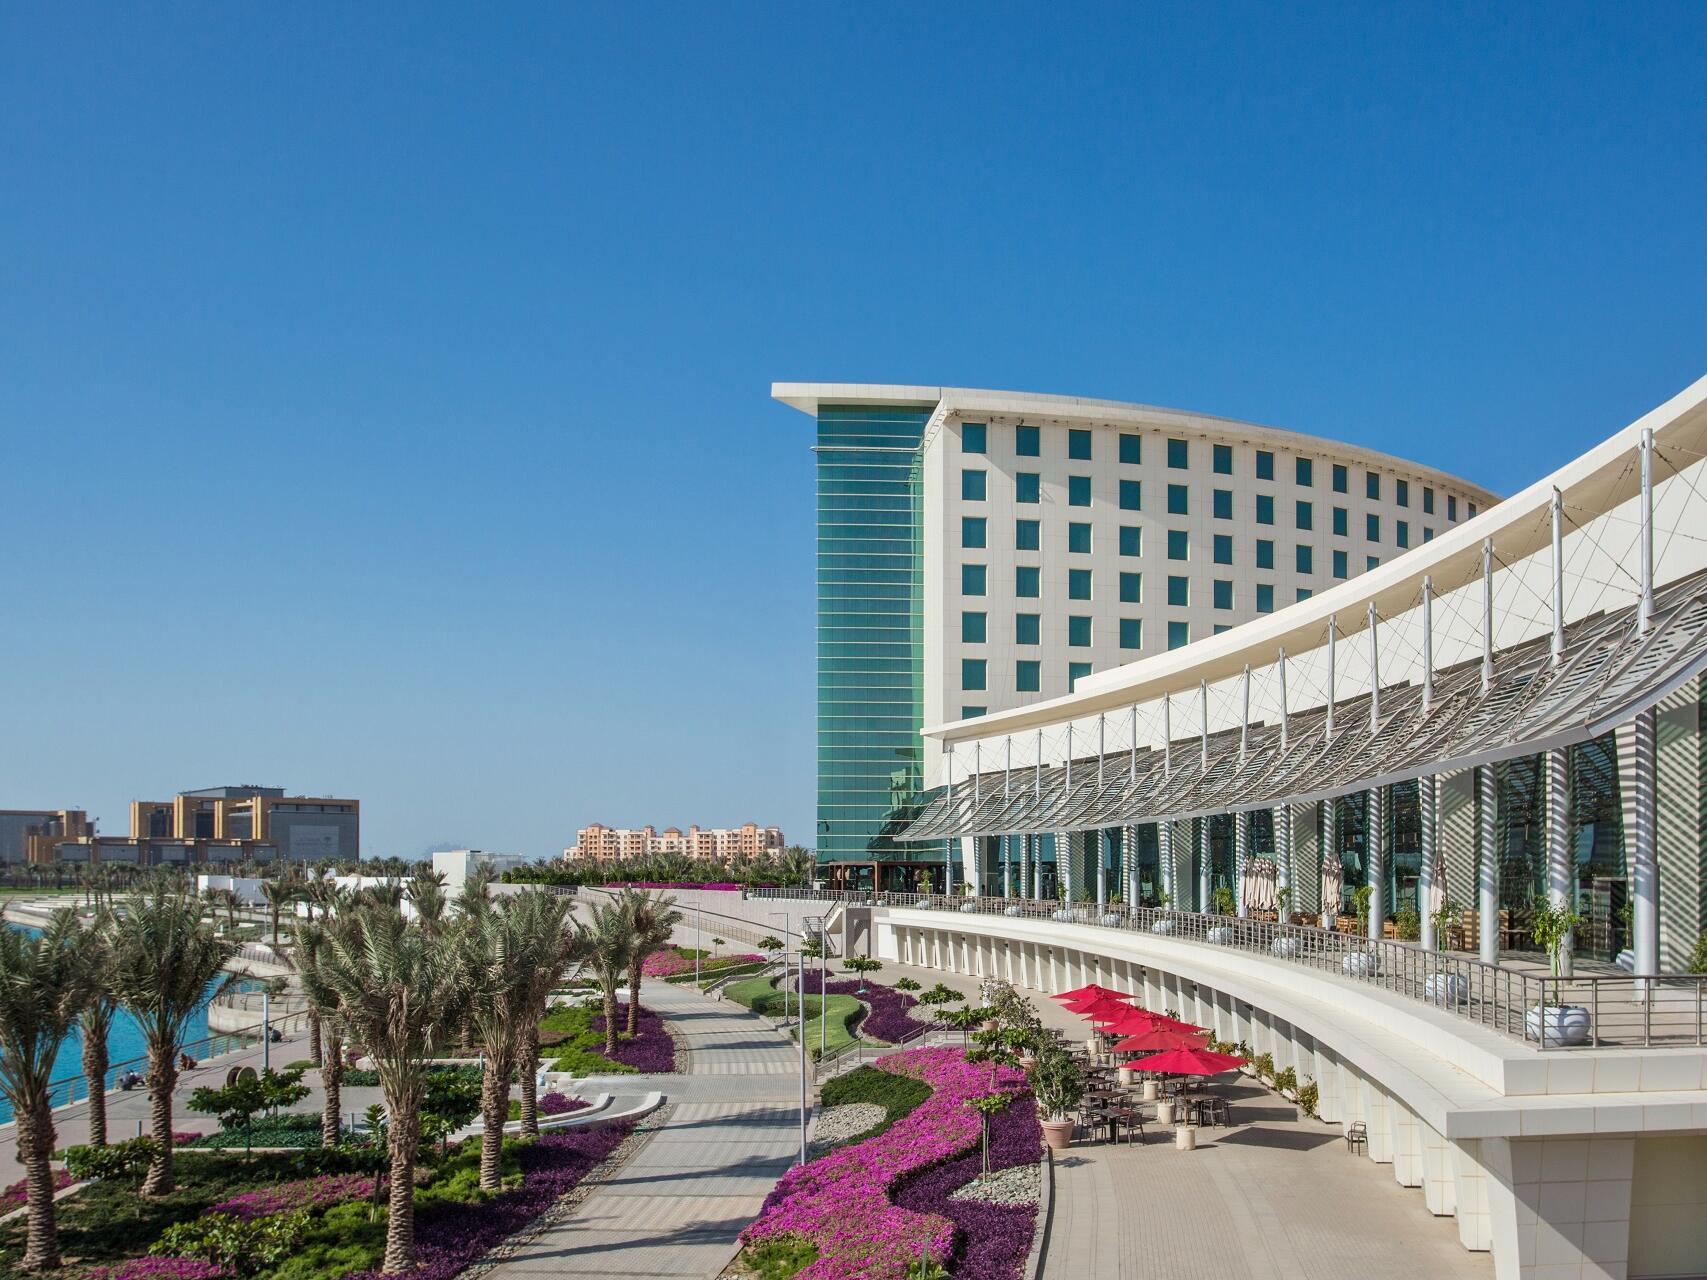 Exterior view of Bay La Sun Hotel & Marina